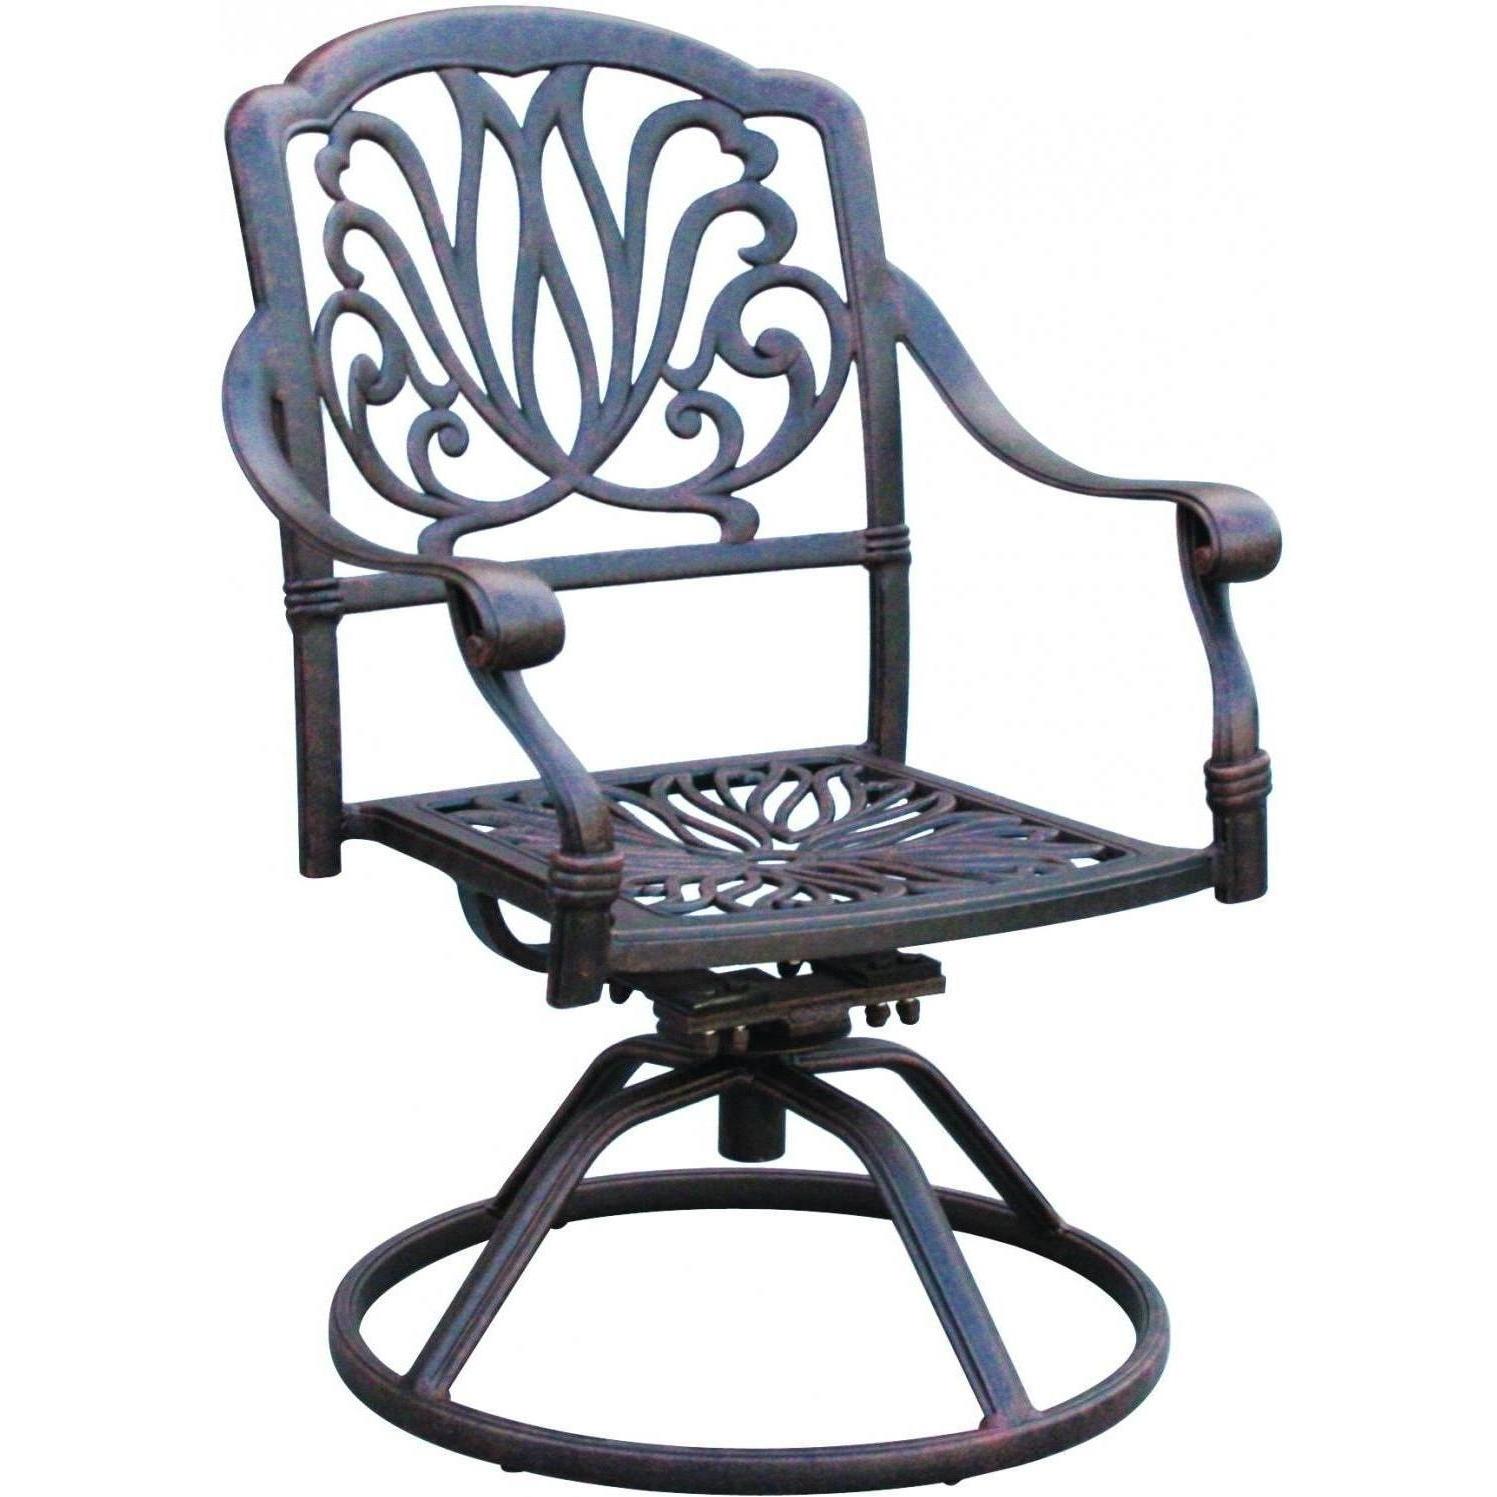 Darlee Elisabeth Cast Aluminum Patio Swivel Rocker Dining Chair For 2018 Aluminum Patio Rocking Chairs (View 7 of 15)